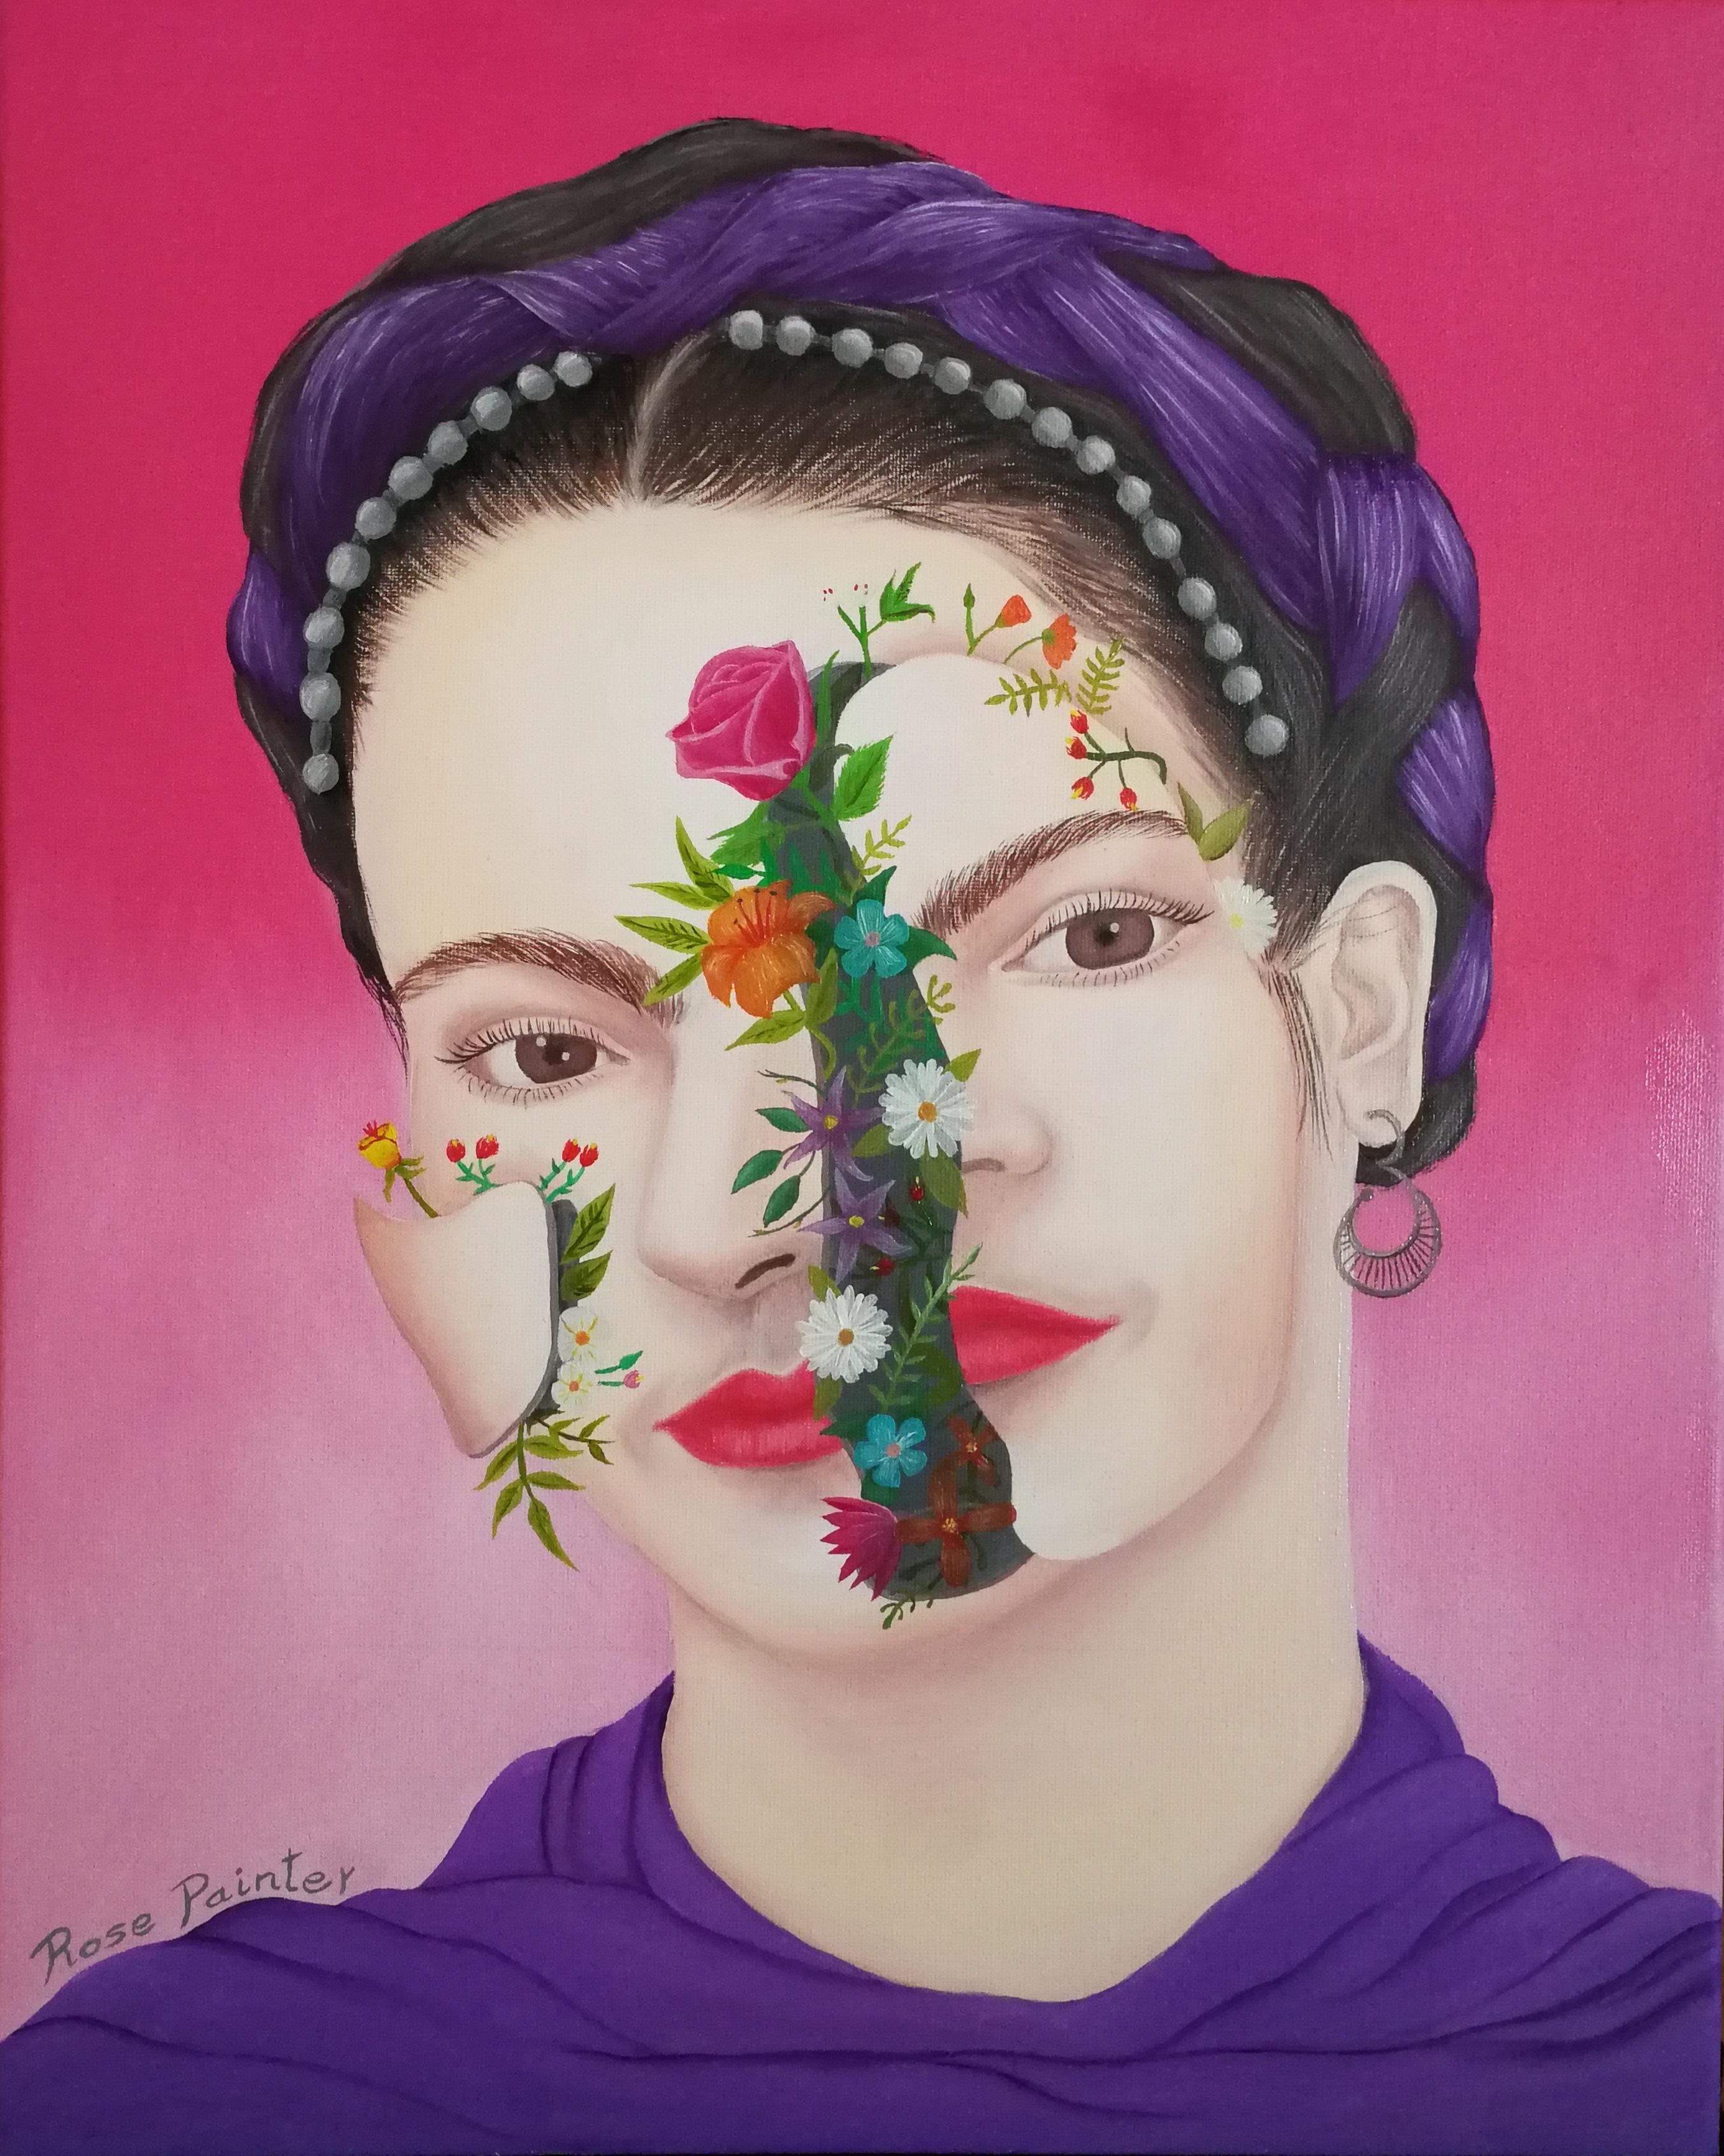 Frida Kahlo - Oil painting